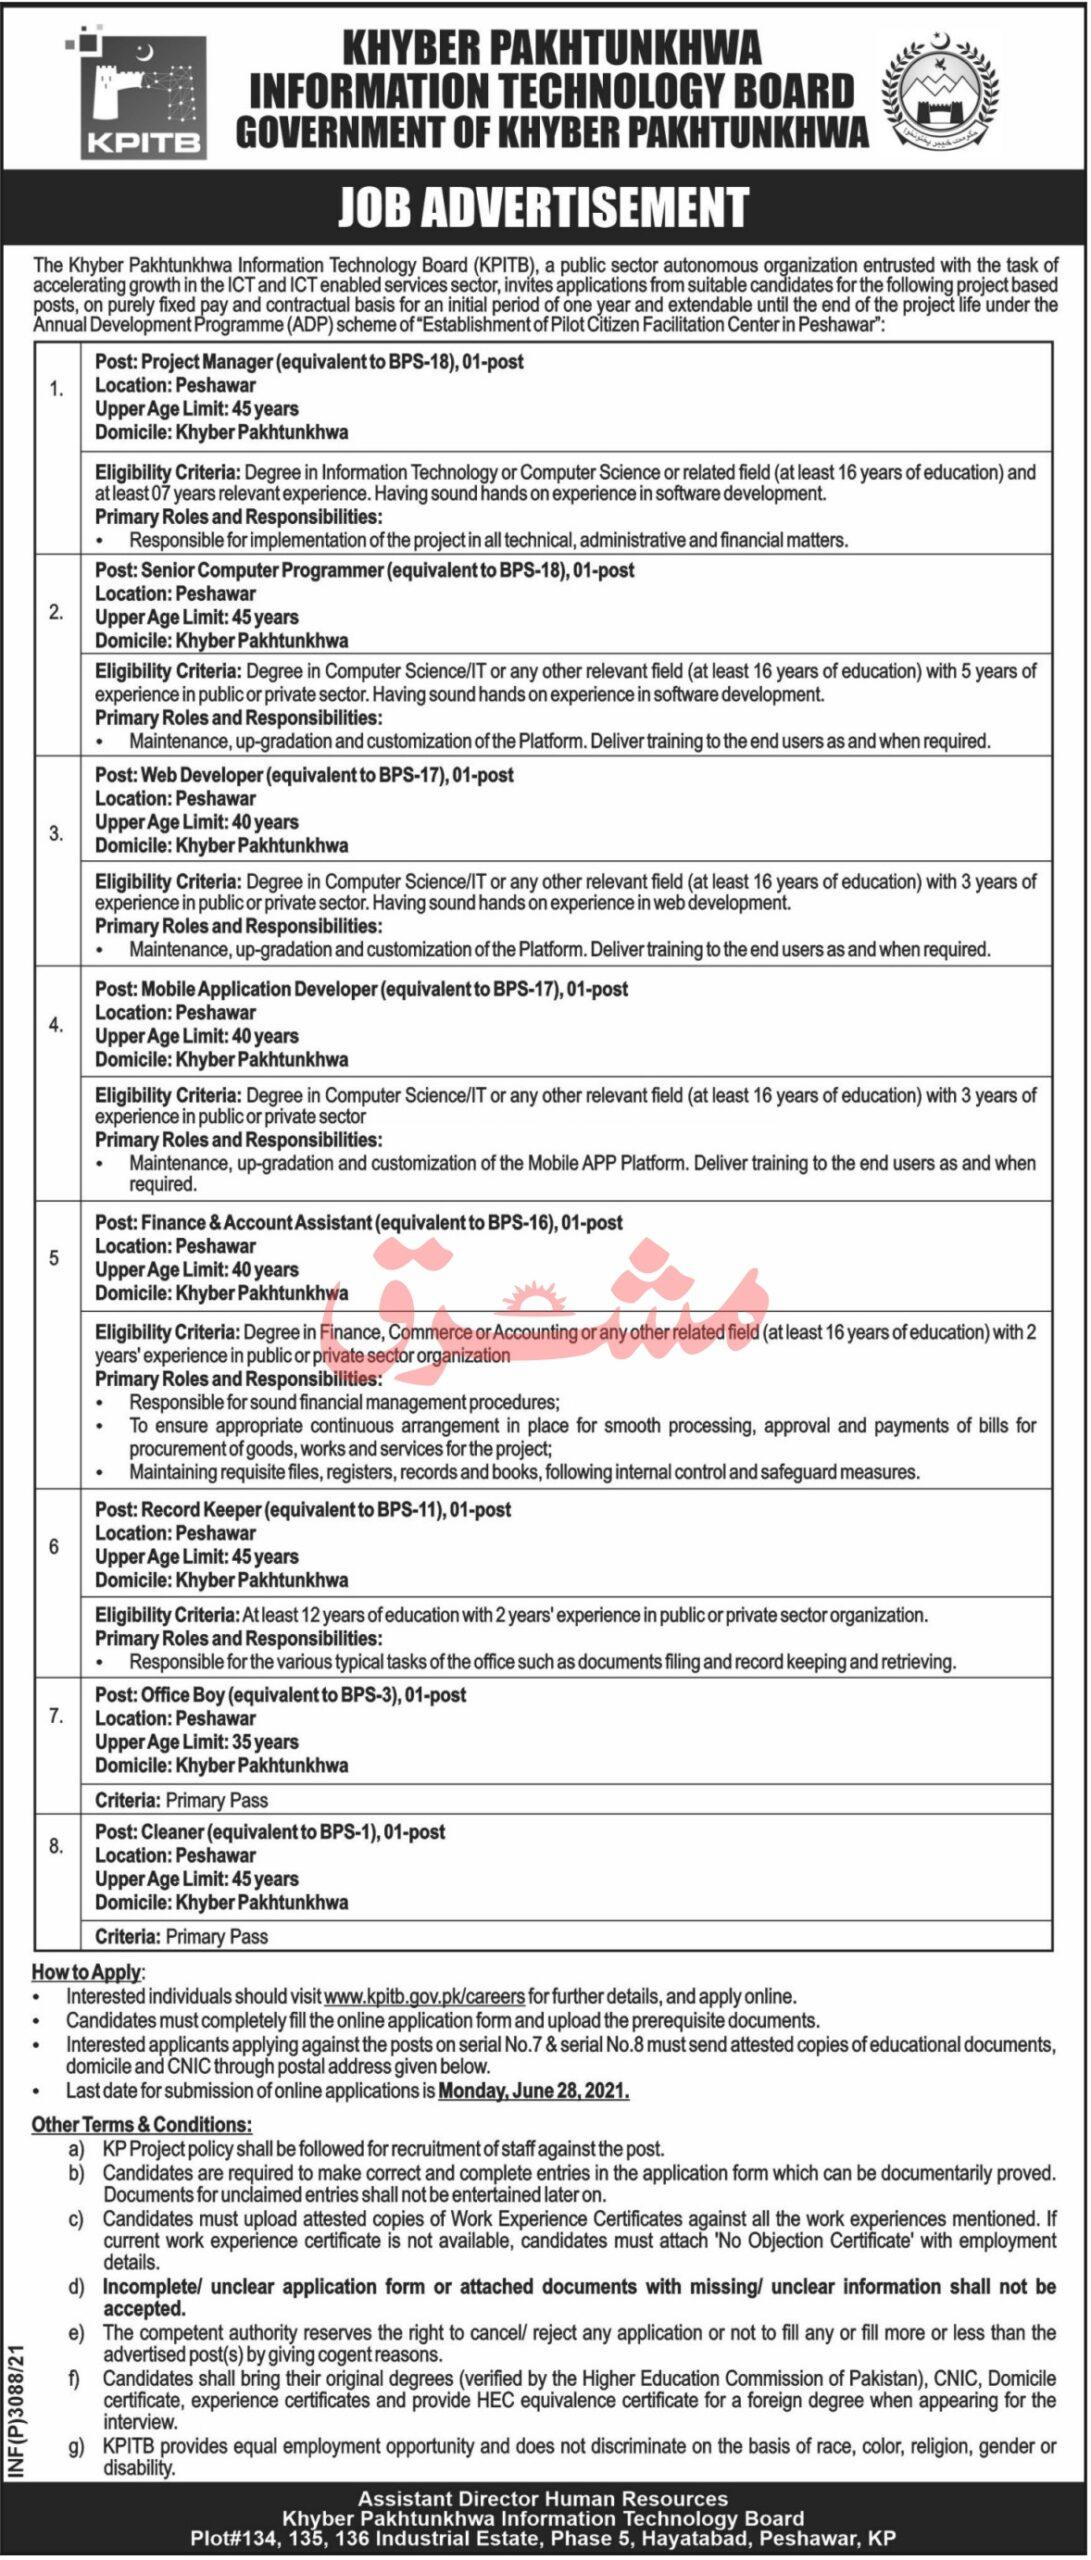 KPK Information Technology Board Job 2021 - KPITB Latest Jobs June 2021